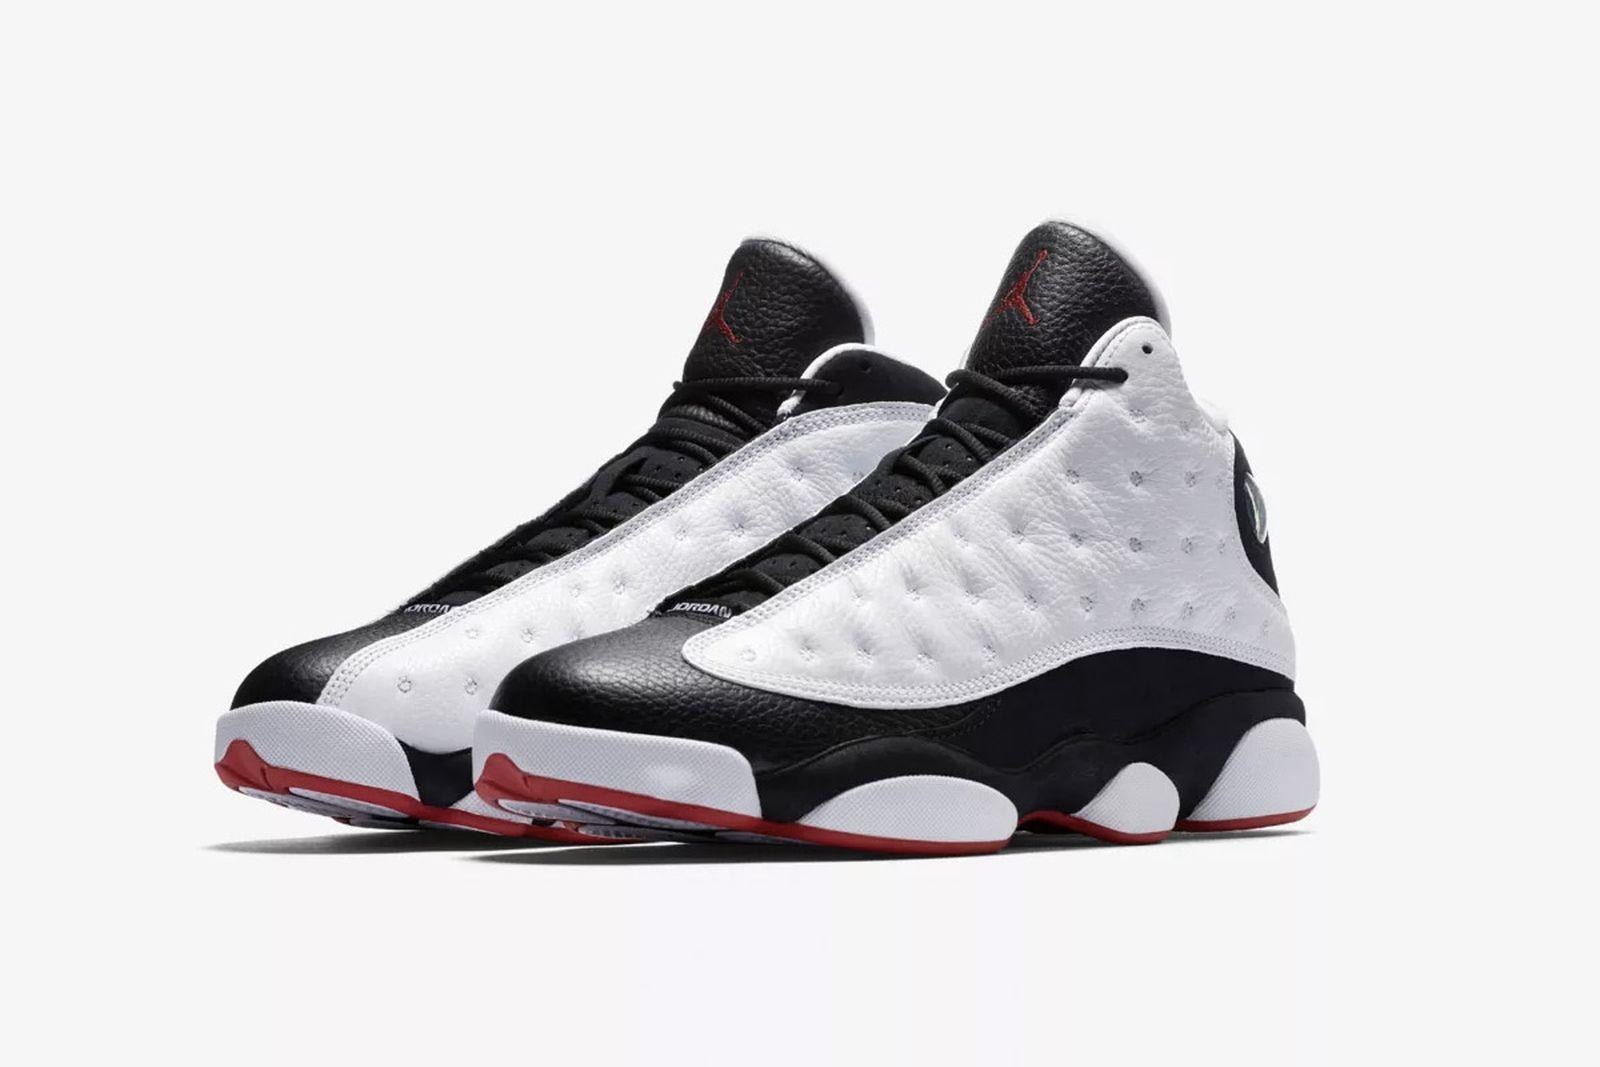 Nike Air Jordan XIII OG: Release Date, Price & Info